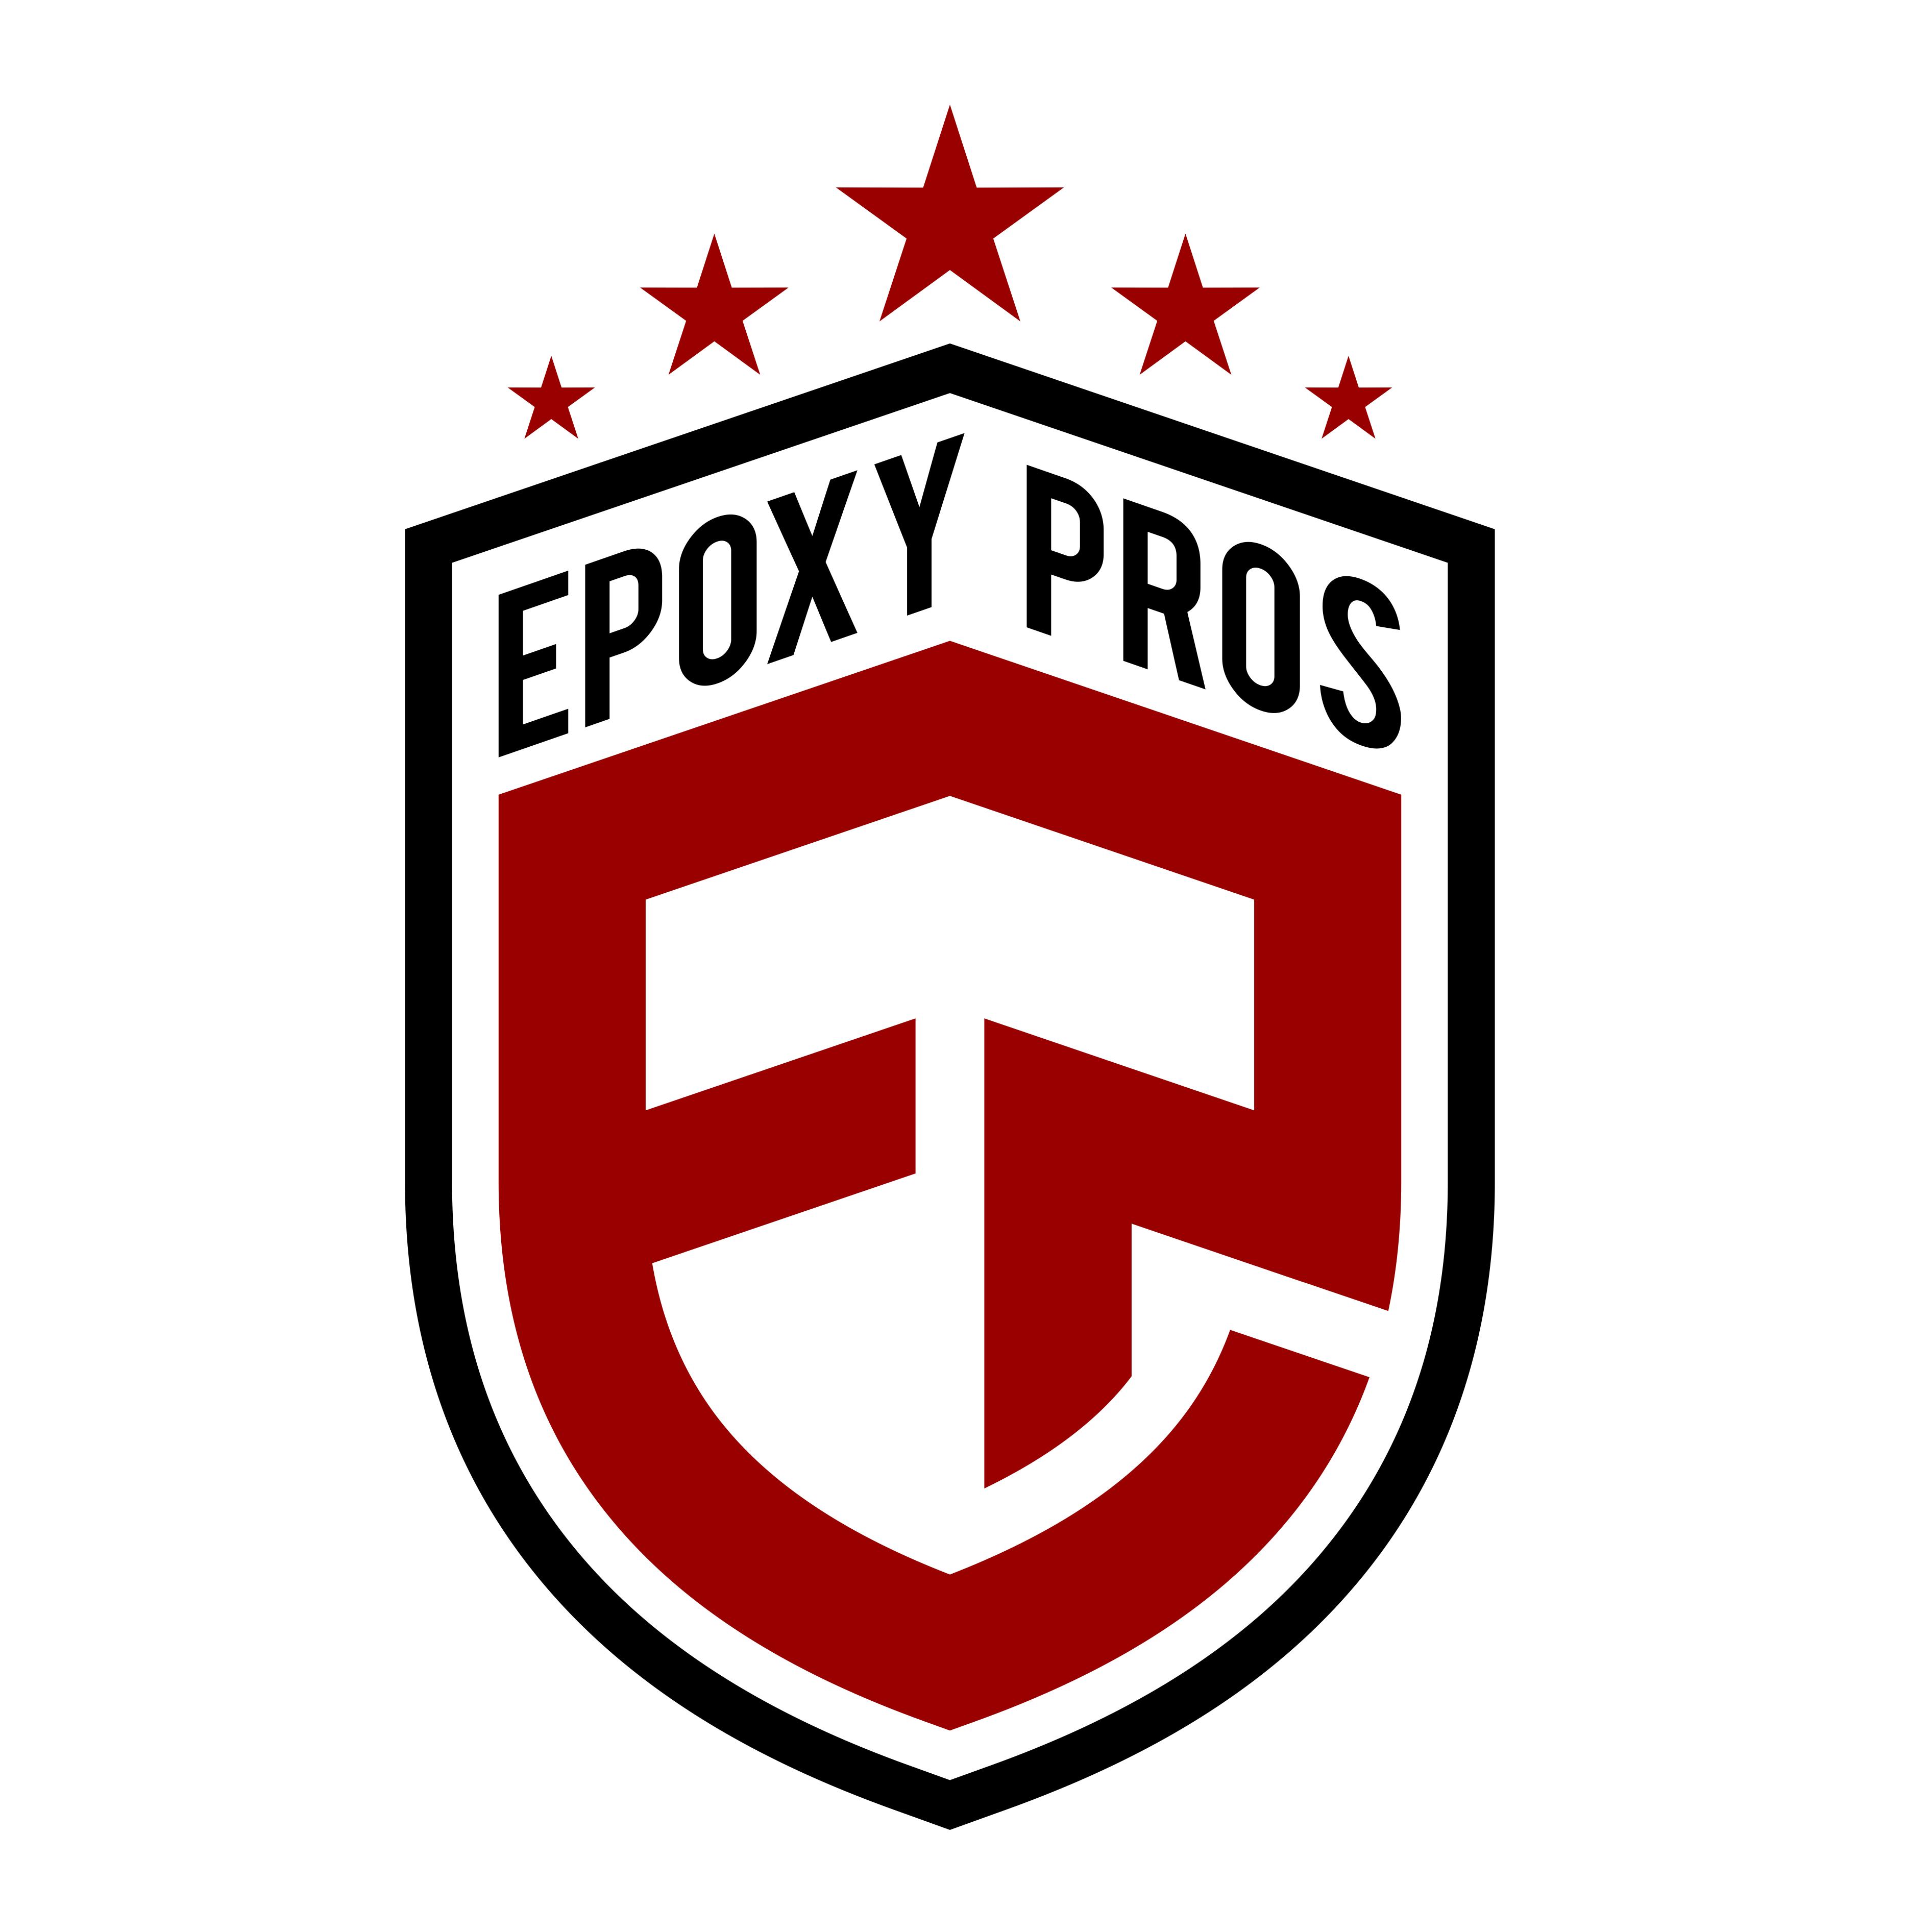 Epoxy Pros DFW